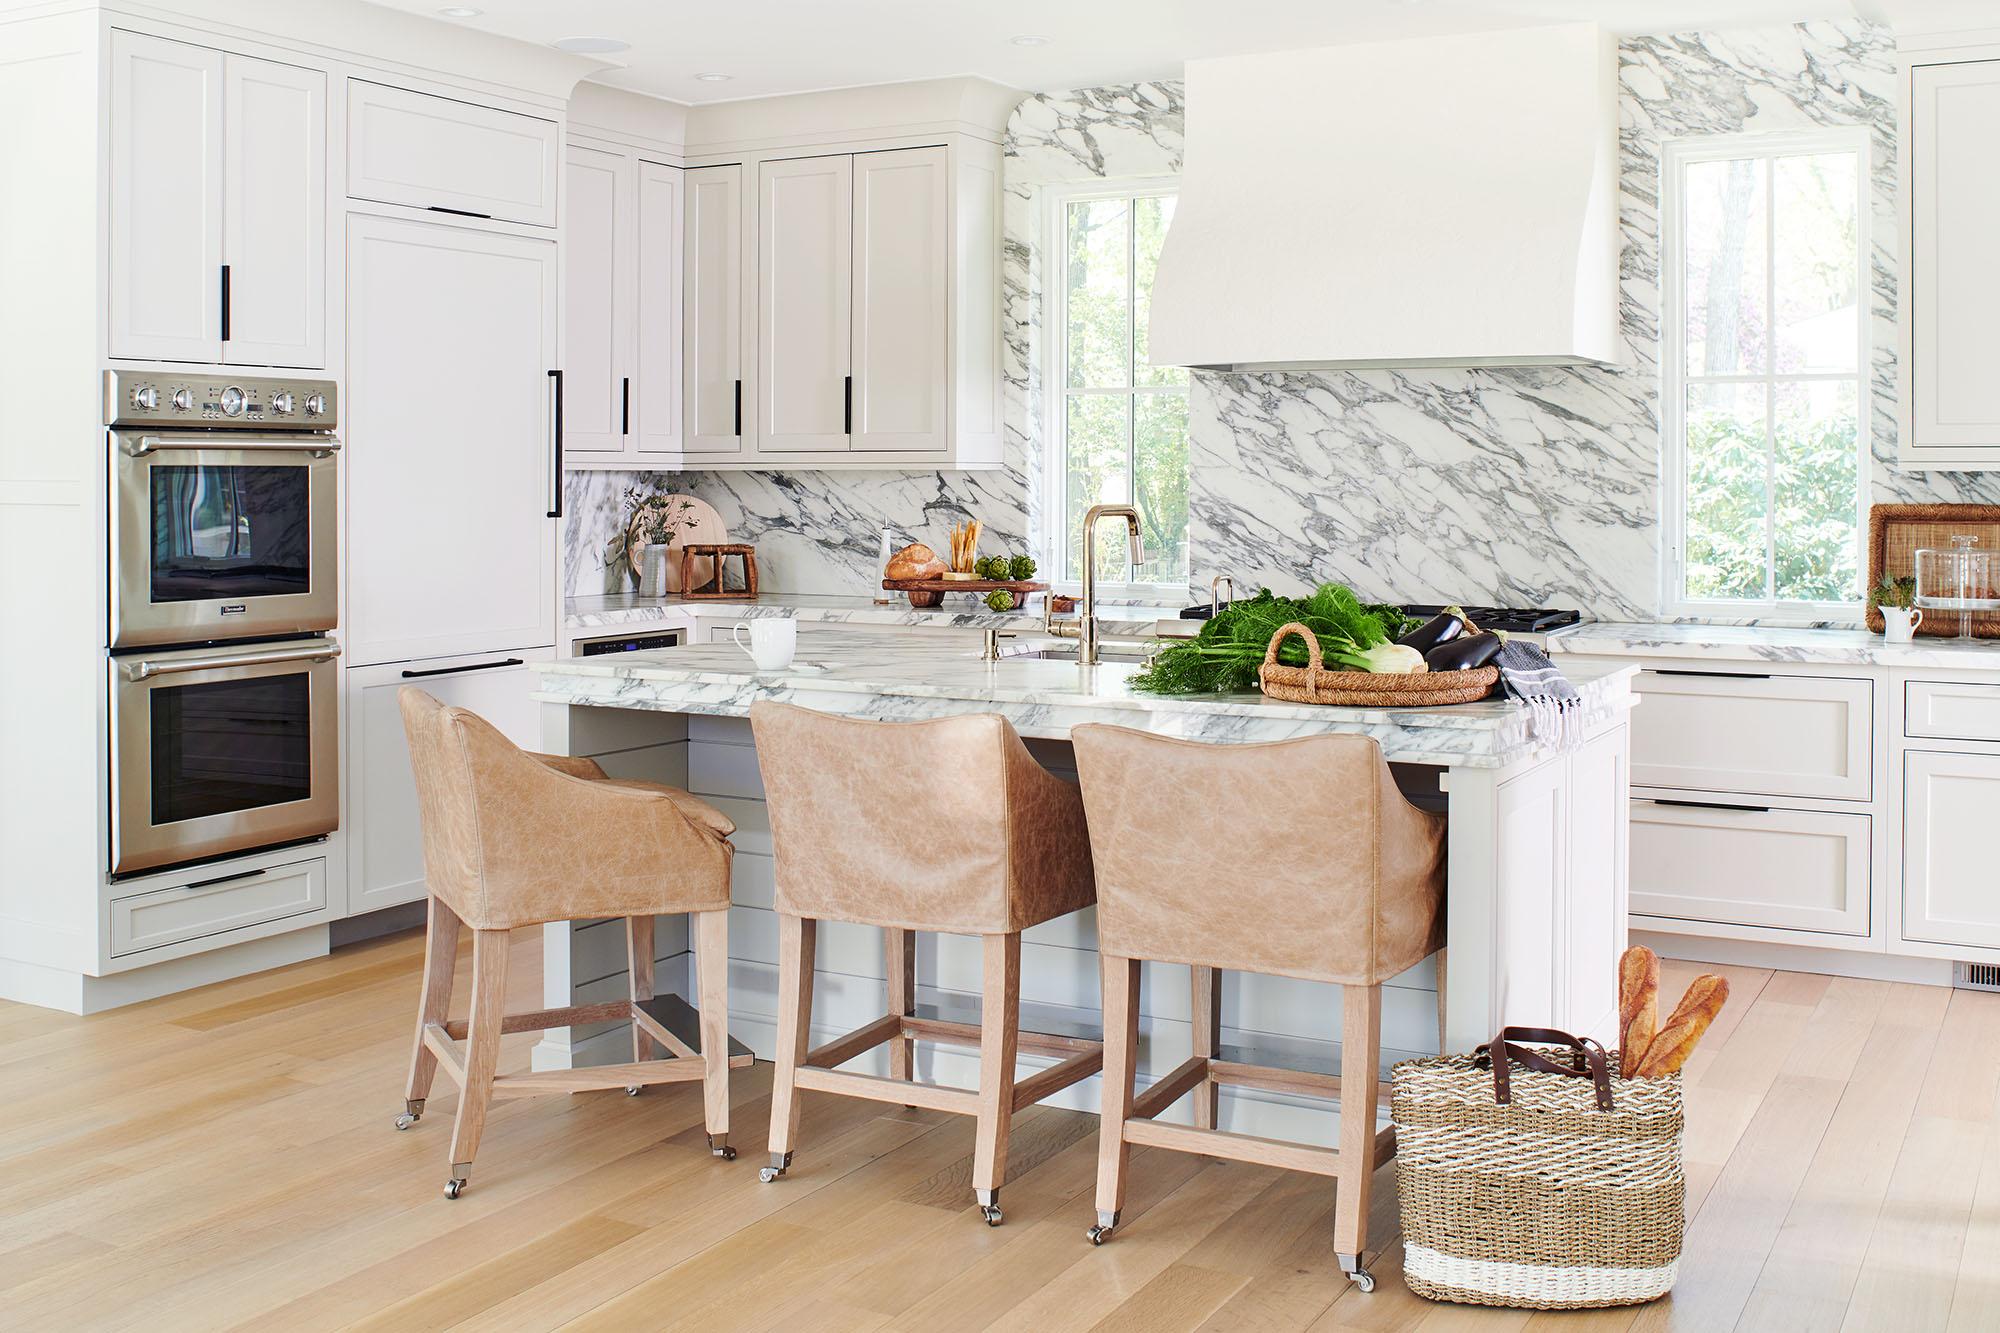 custom kitchen design build westfield nj